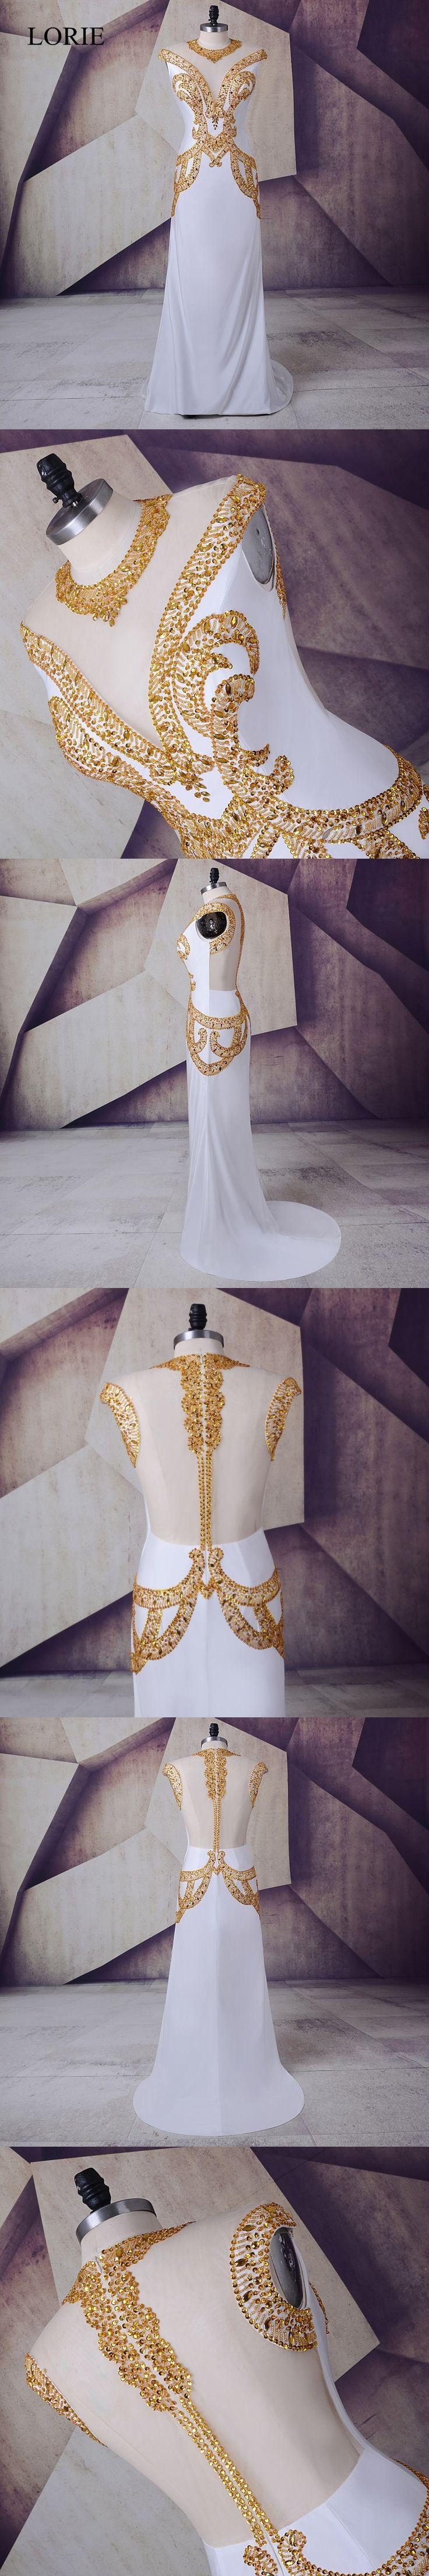 White Gold Prom Dress 2017 LORIE Vestidos de gala largos Spandex Plus Size Evening Gown Sheer Illusion Formal Long Party Dresses